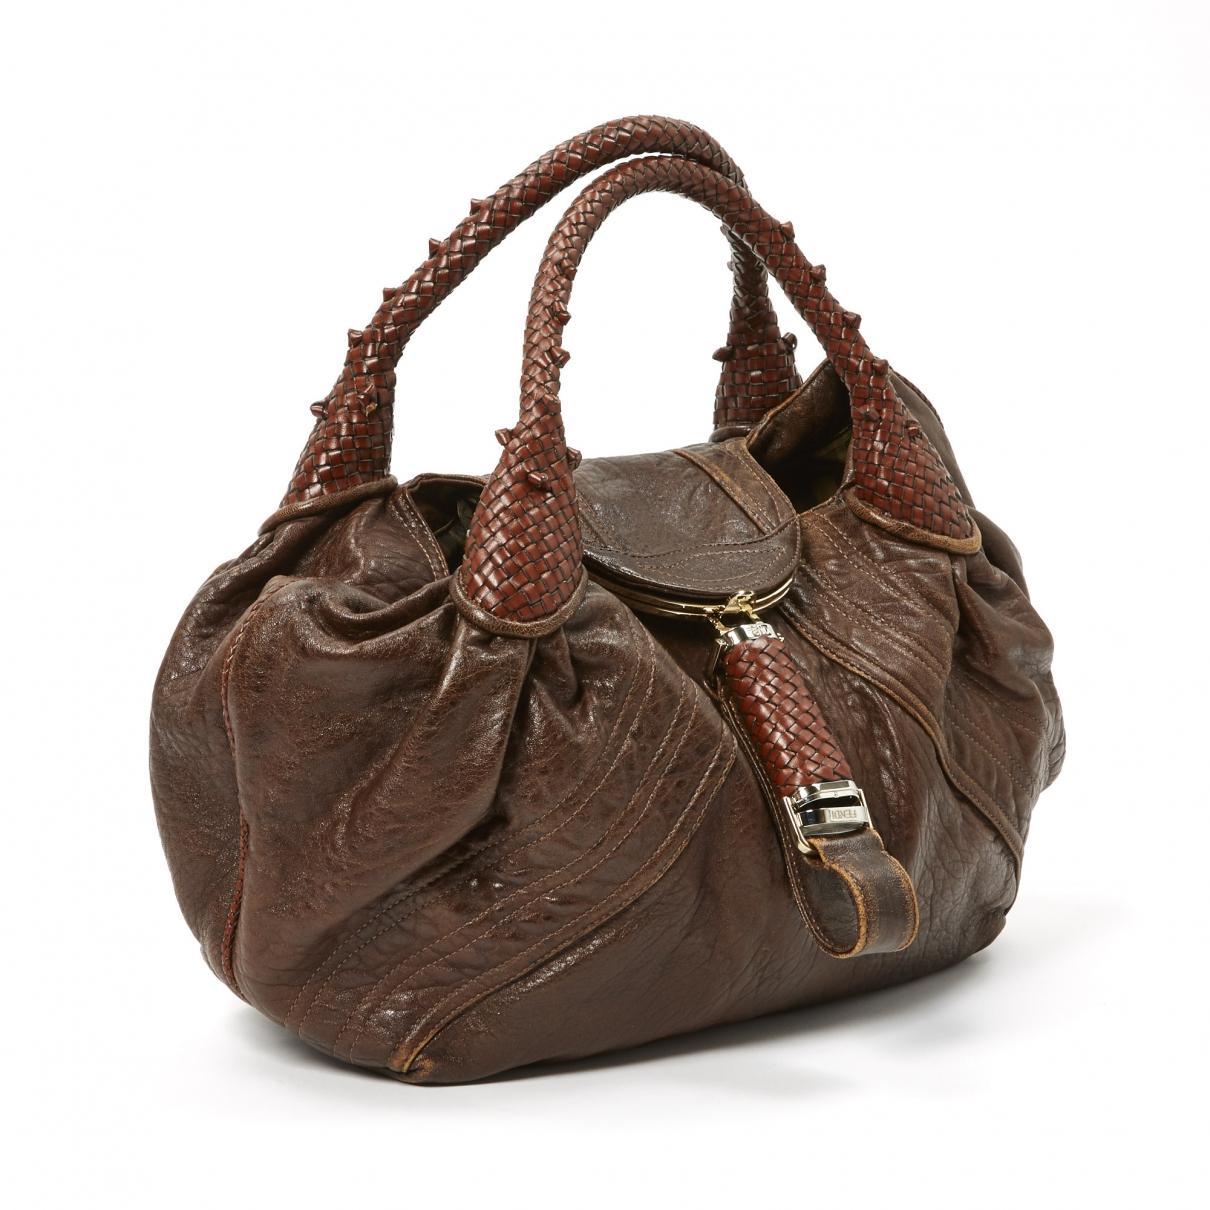 1b8ecfbbb0e2 Fendi Pre-owned Spy Brown Leather Handbags in Brown - Lyst